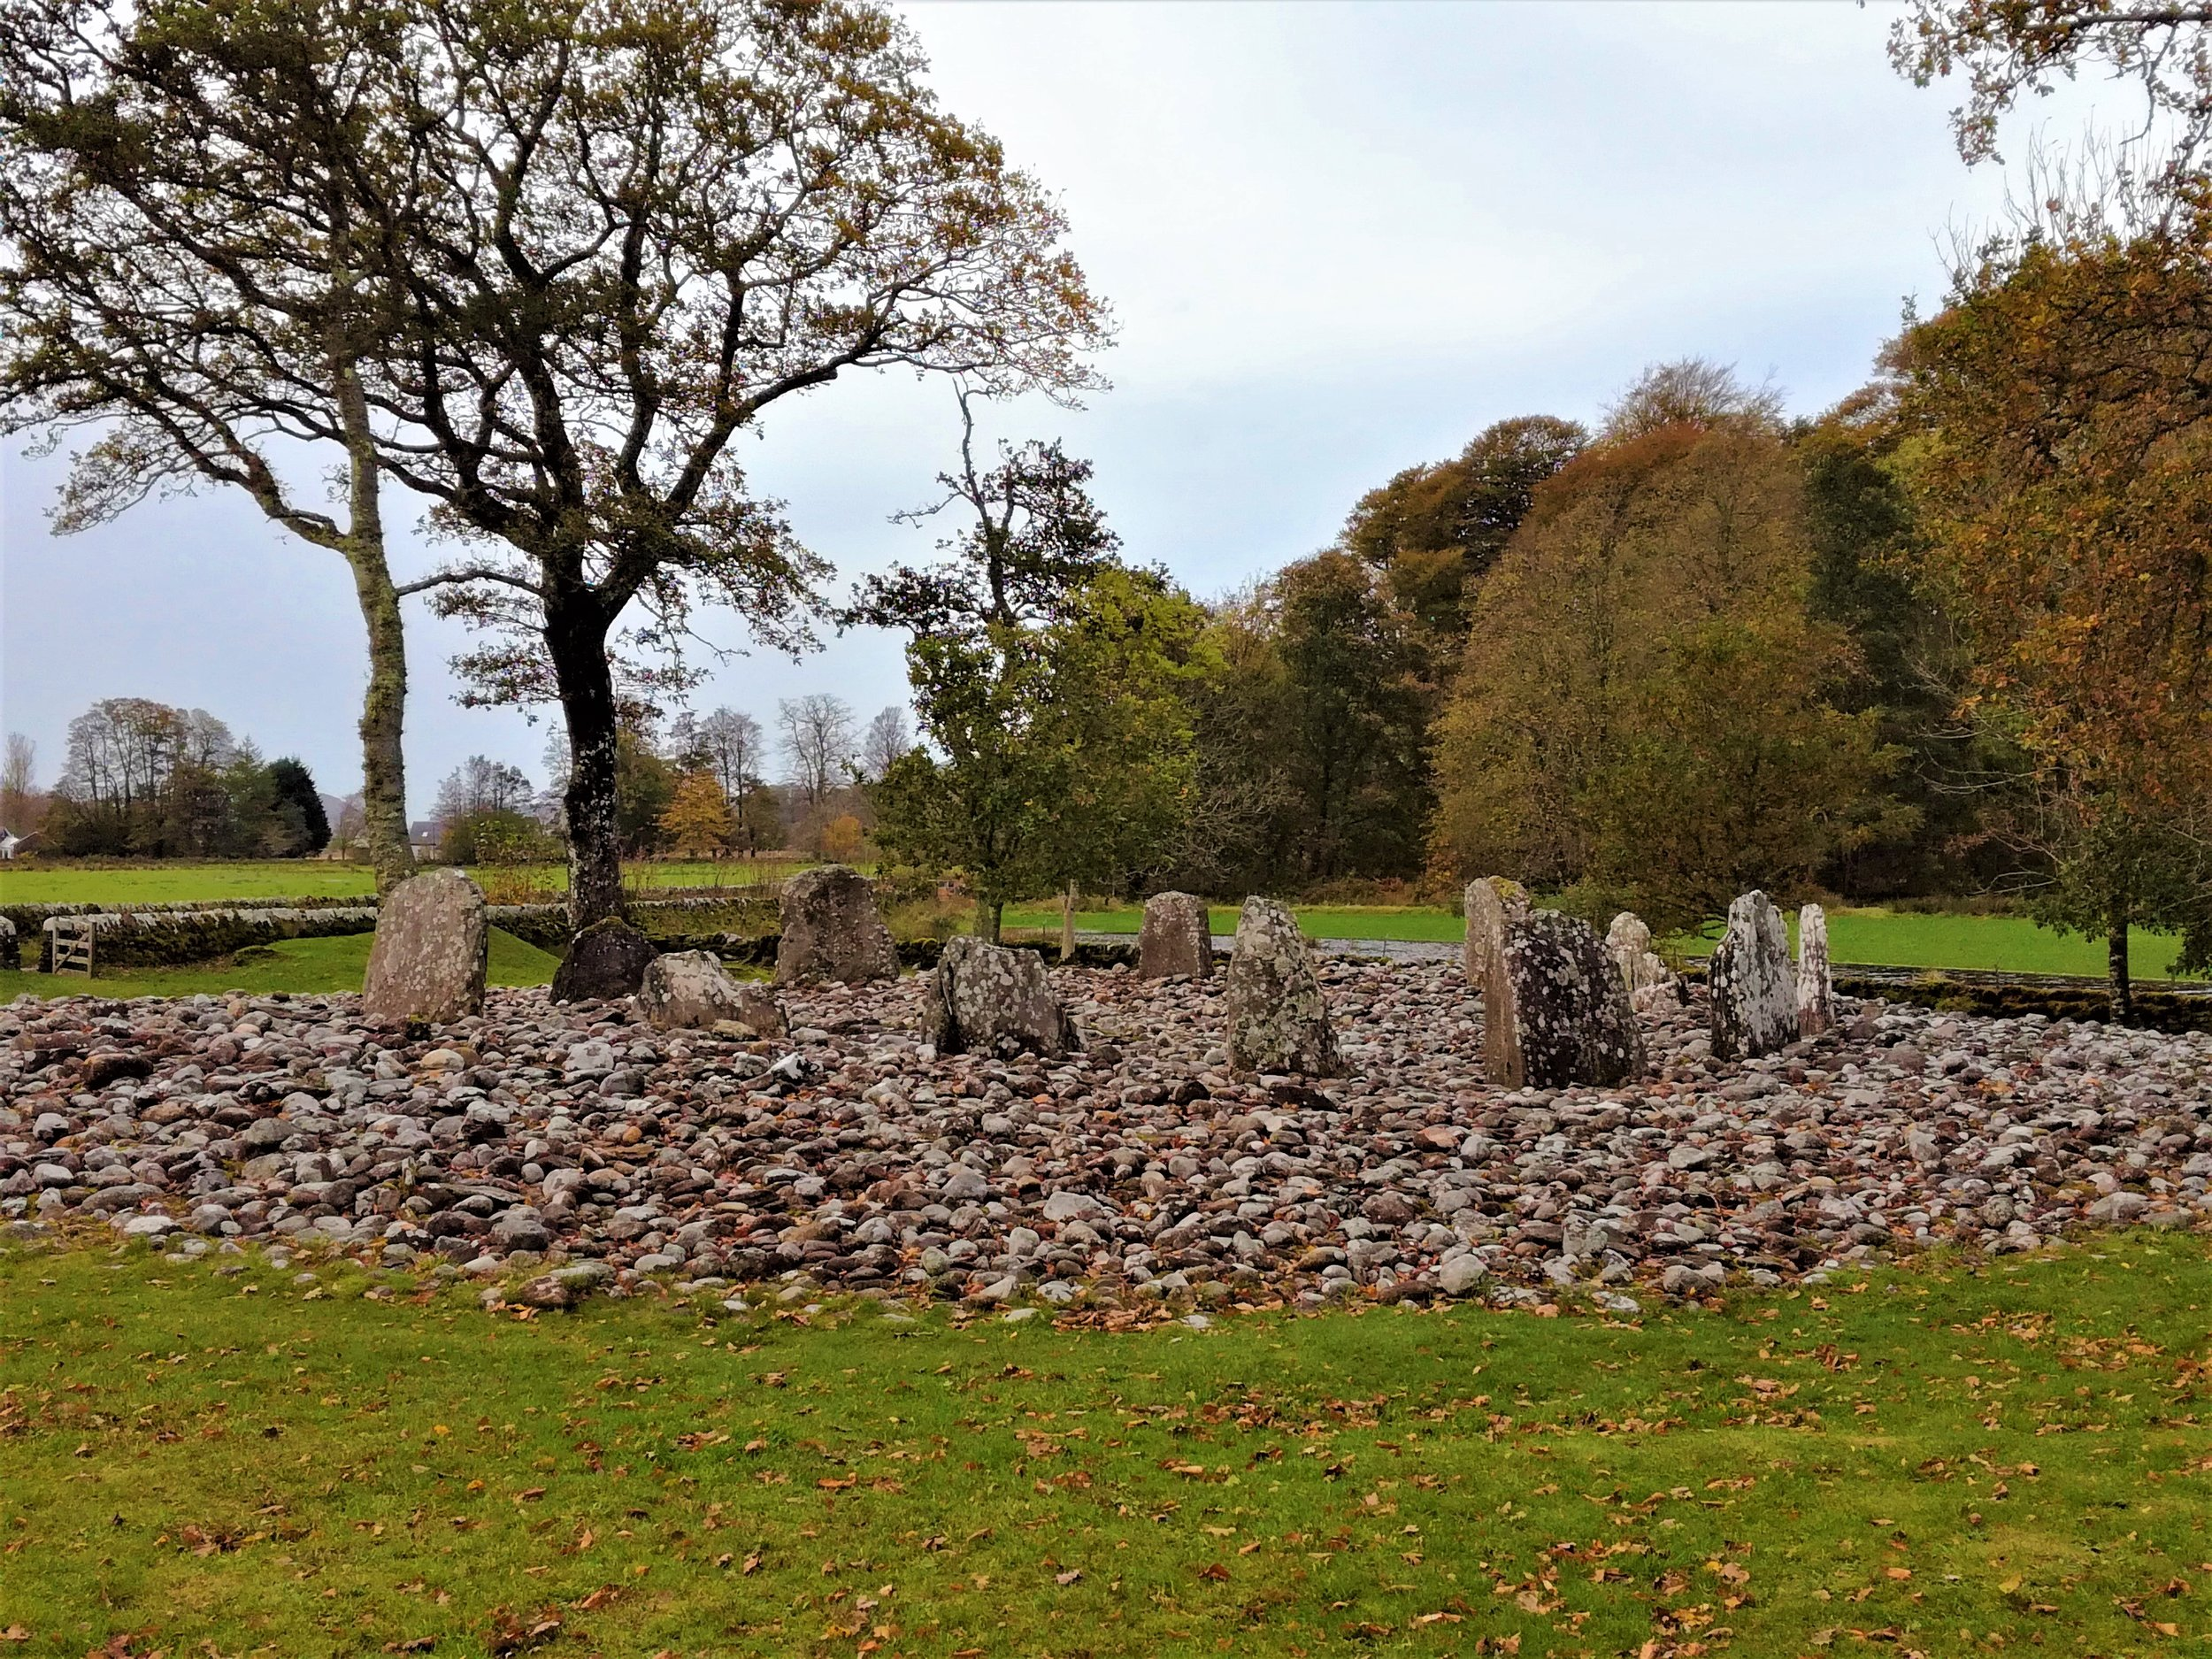 Stone circle and burial cist, Kilmartin, Argyll -  Tour & Walk in small groups - Roaming Scotland.jpg